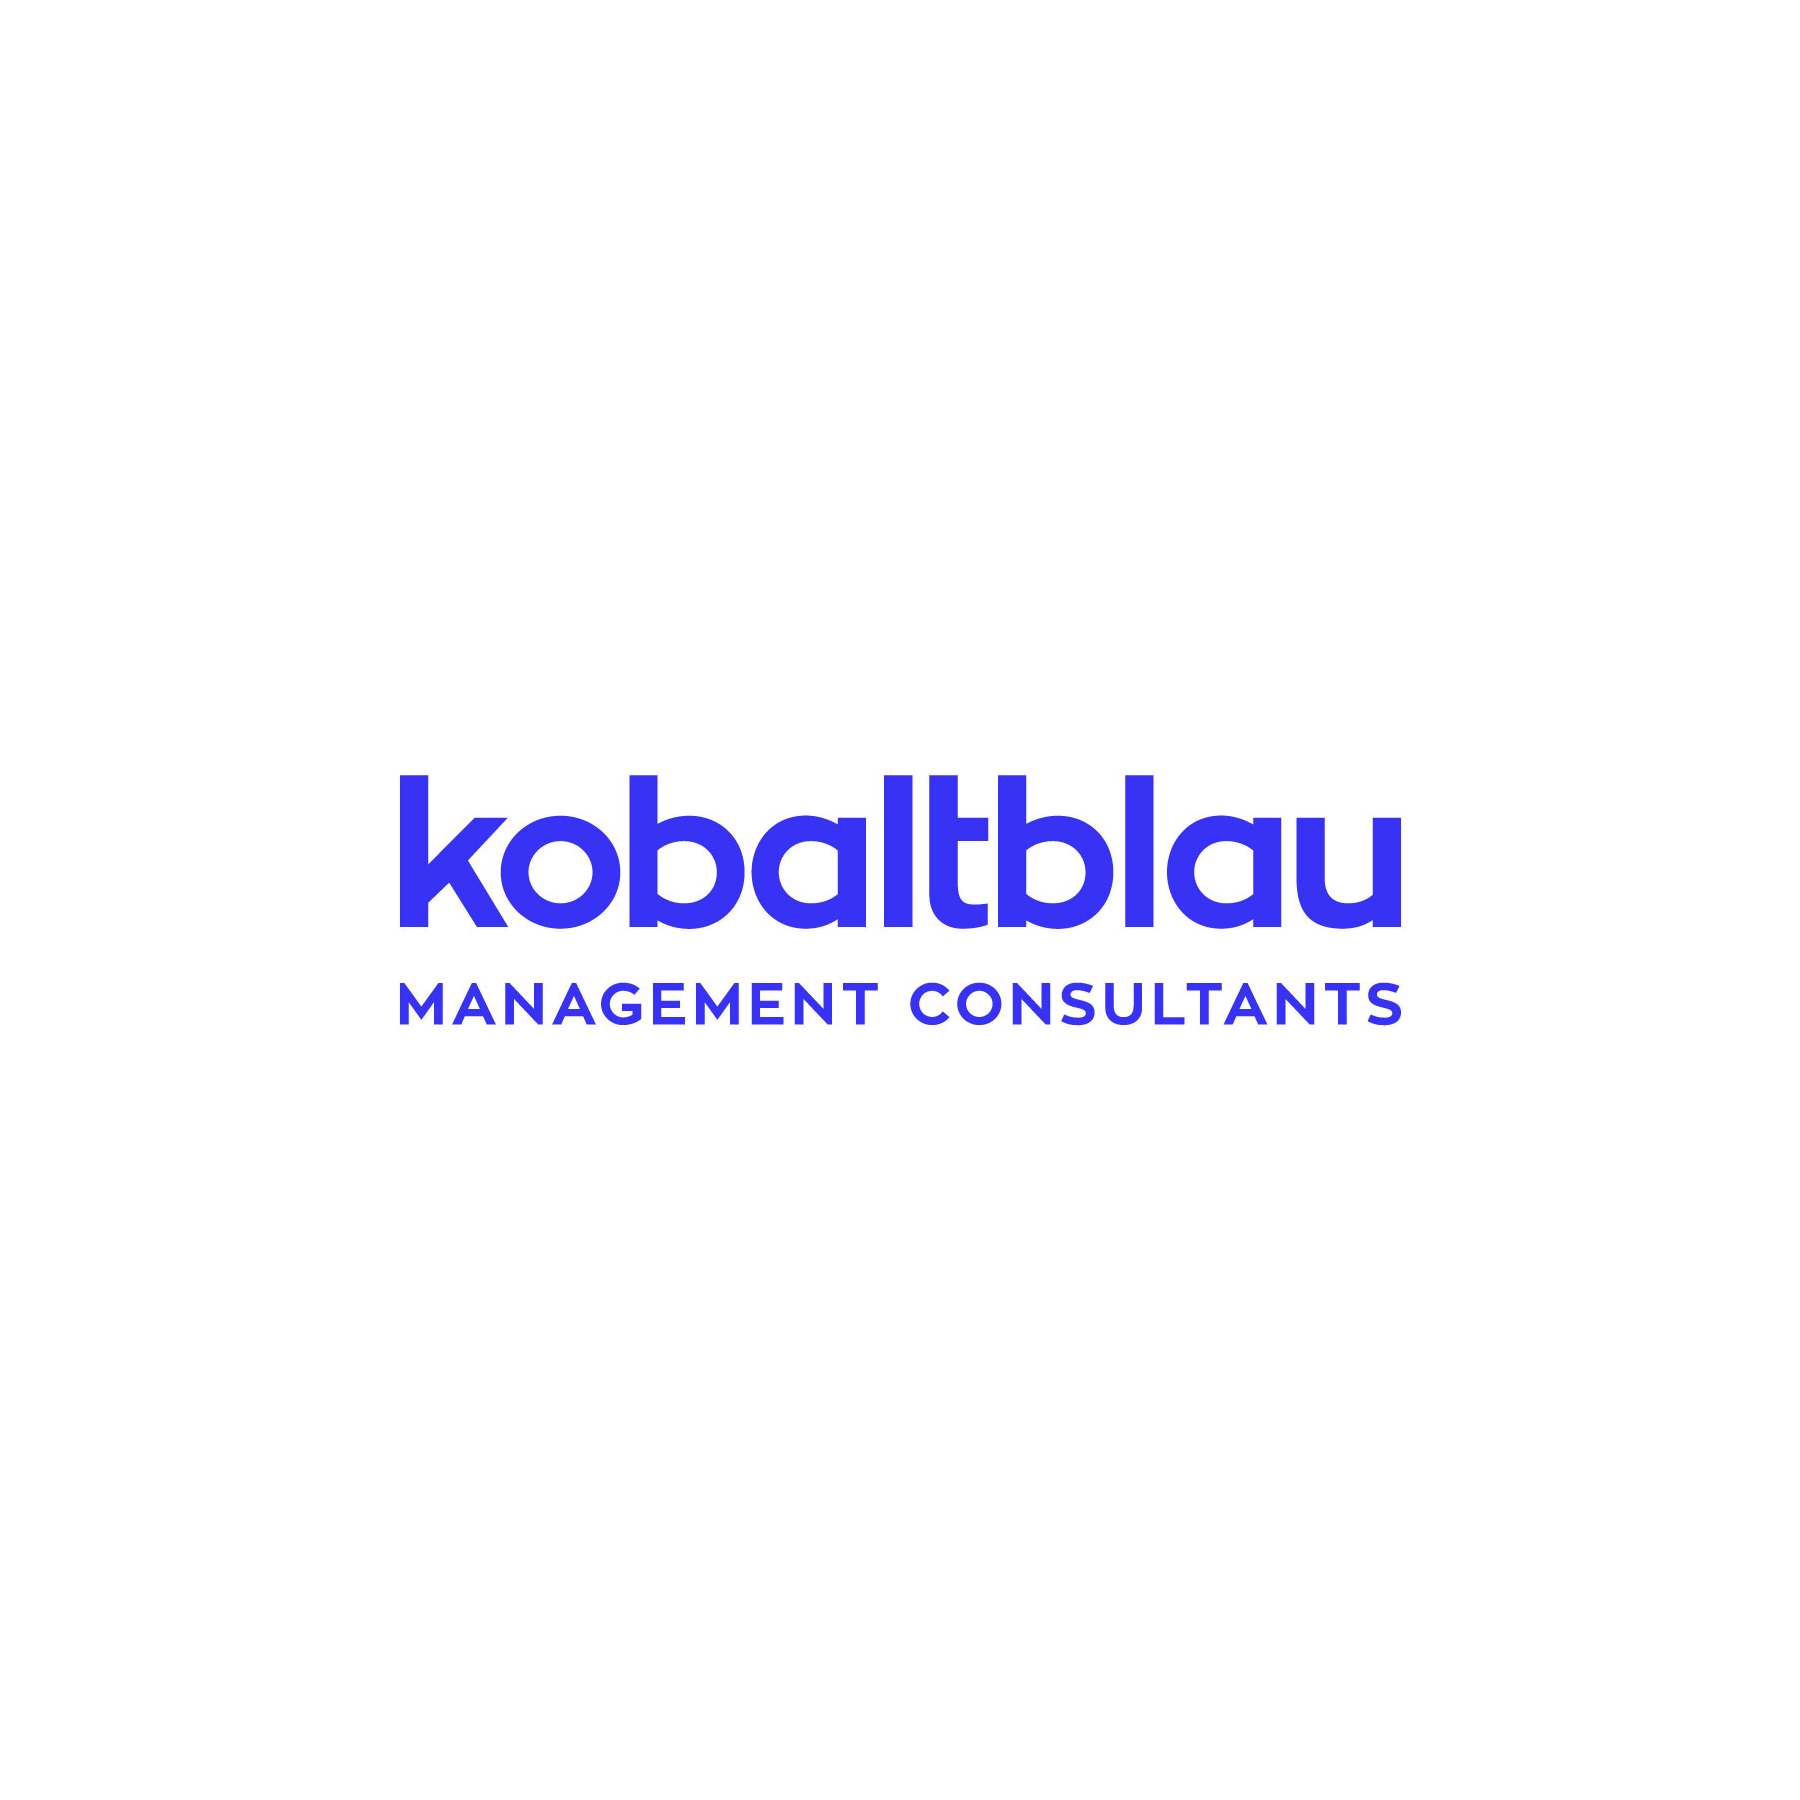 kobaltblau_20170623.jpg